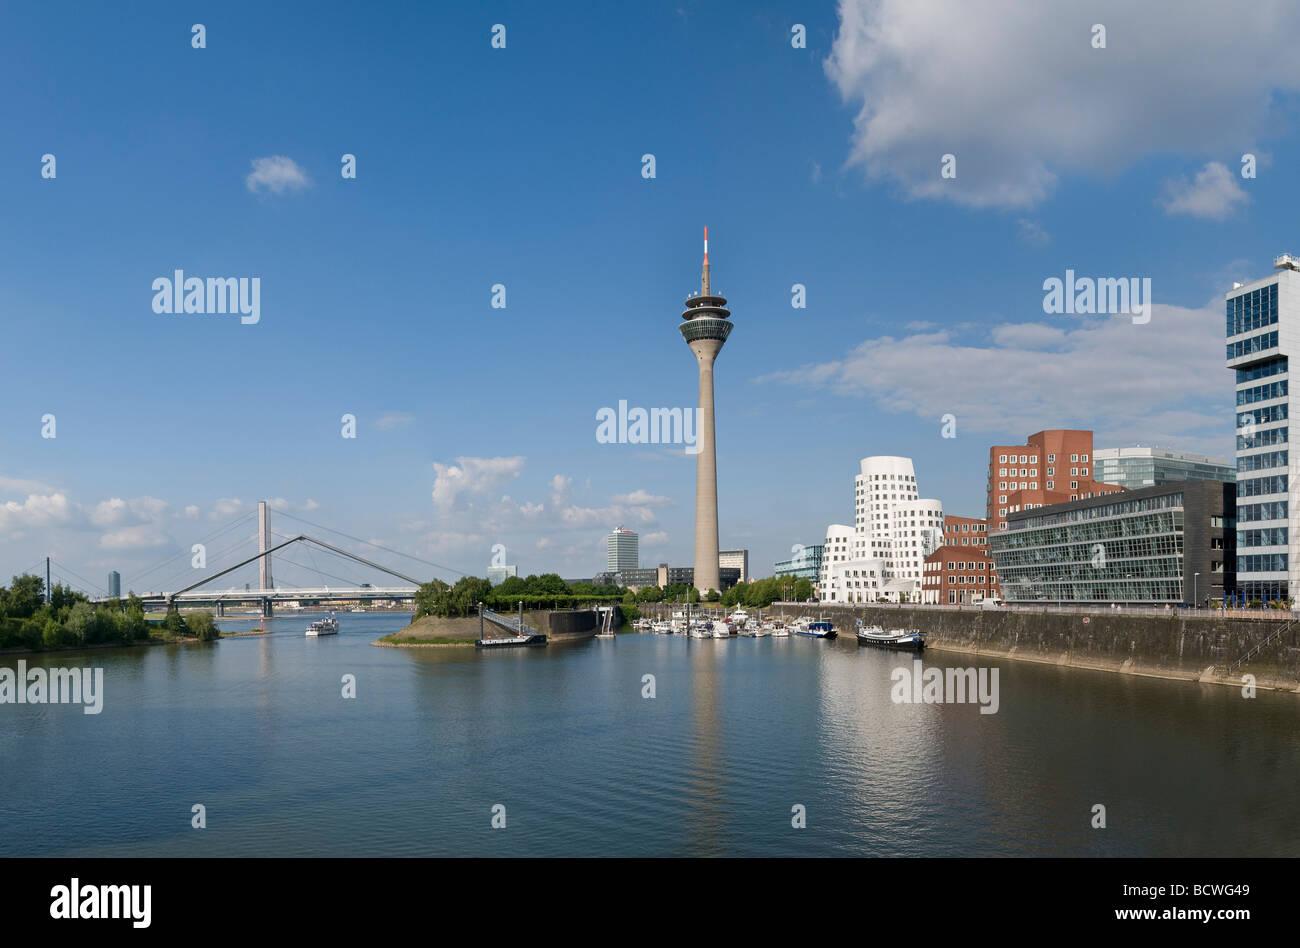 Vista panoramica, Duesseldorf Medienhafen media port, Neuer Zollhof con 'Dancing edifici per uffici' da Immagini Stock